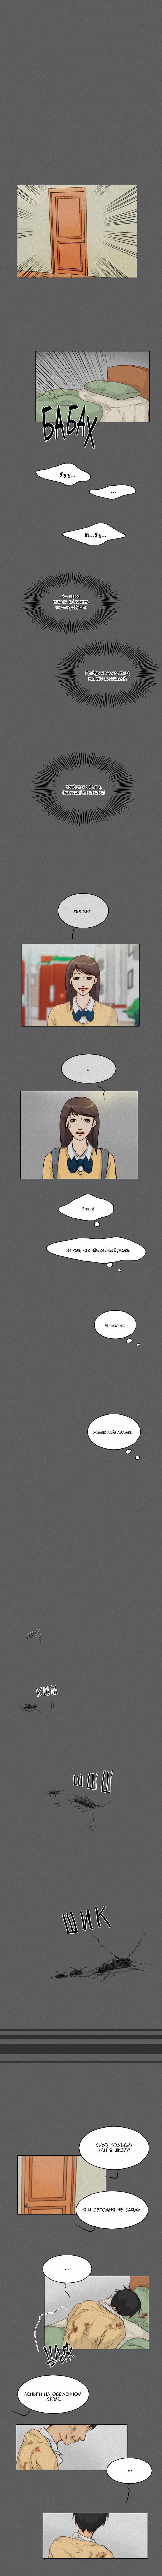 https://r1.ninemanga.com/comics/pic2/8/31048/426343/153504428717.jpg Page 5